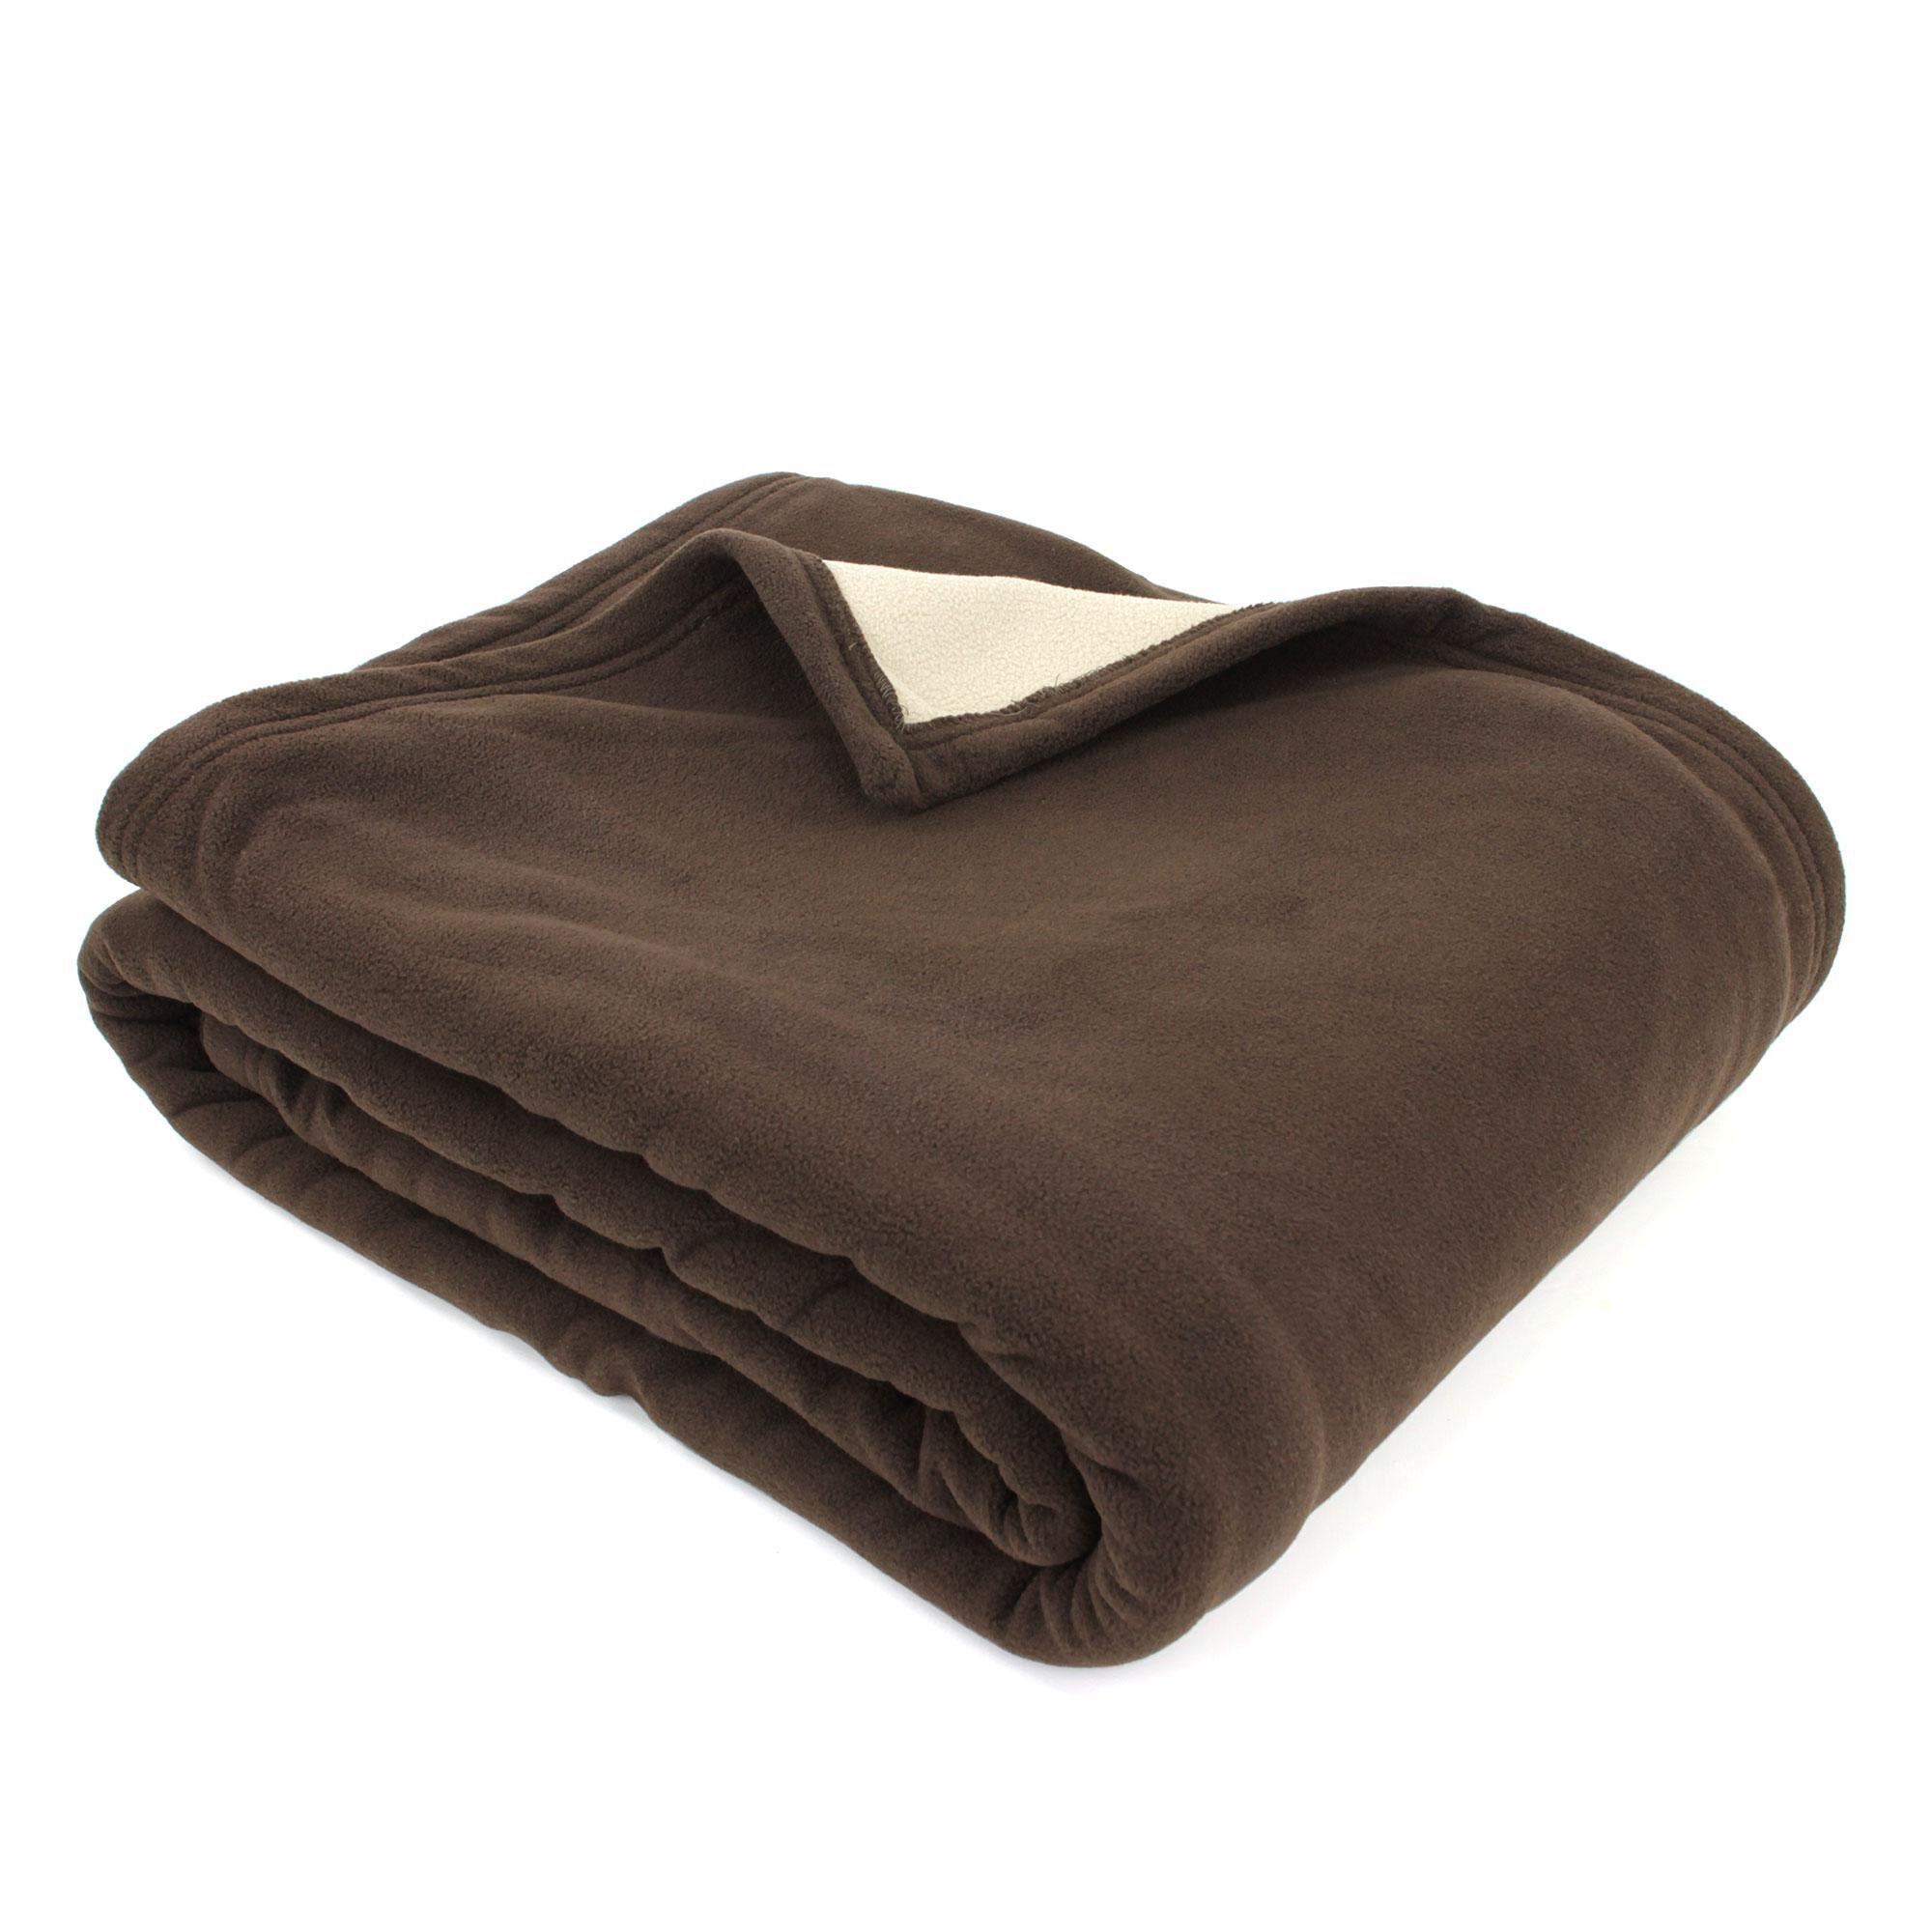 Linnea Couverture polaire luxe 220x240 cm 100% polyester 430 g/m2 NARVIK Marron Chocolat